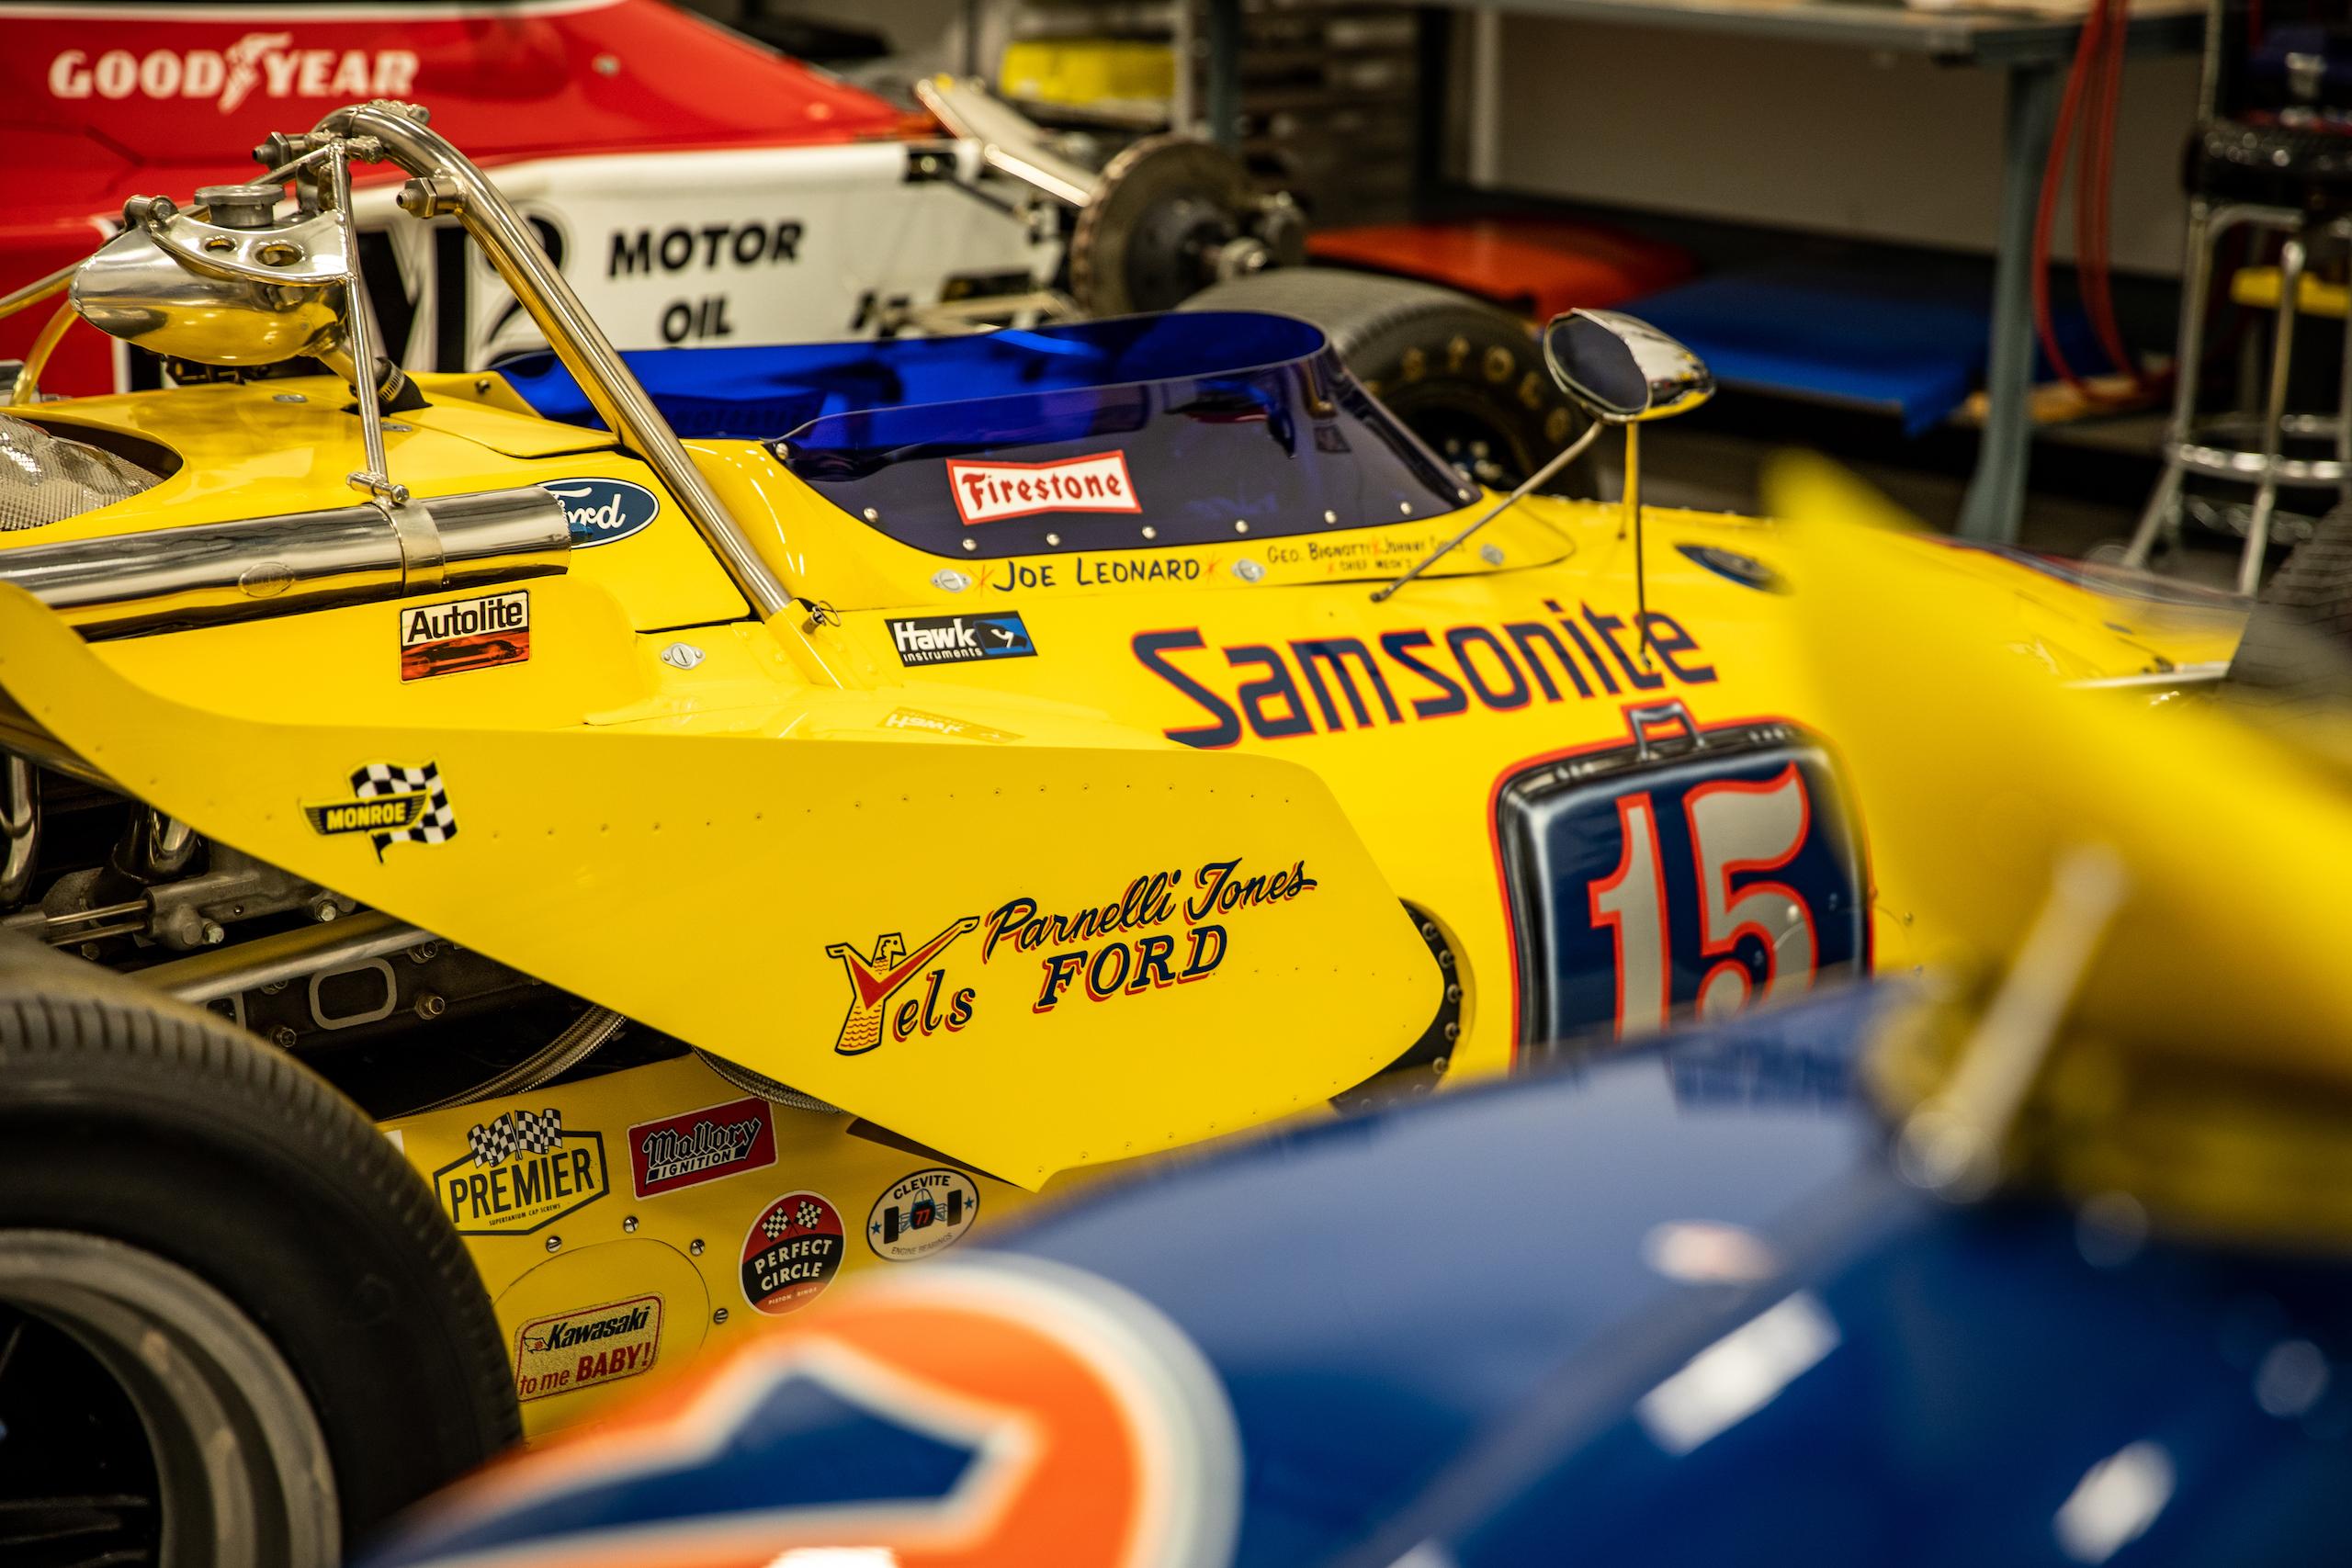 Turn 4 Restorations yellow racer